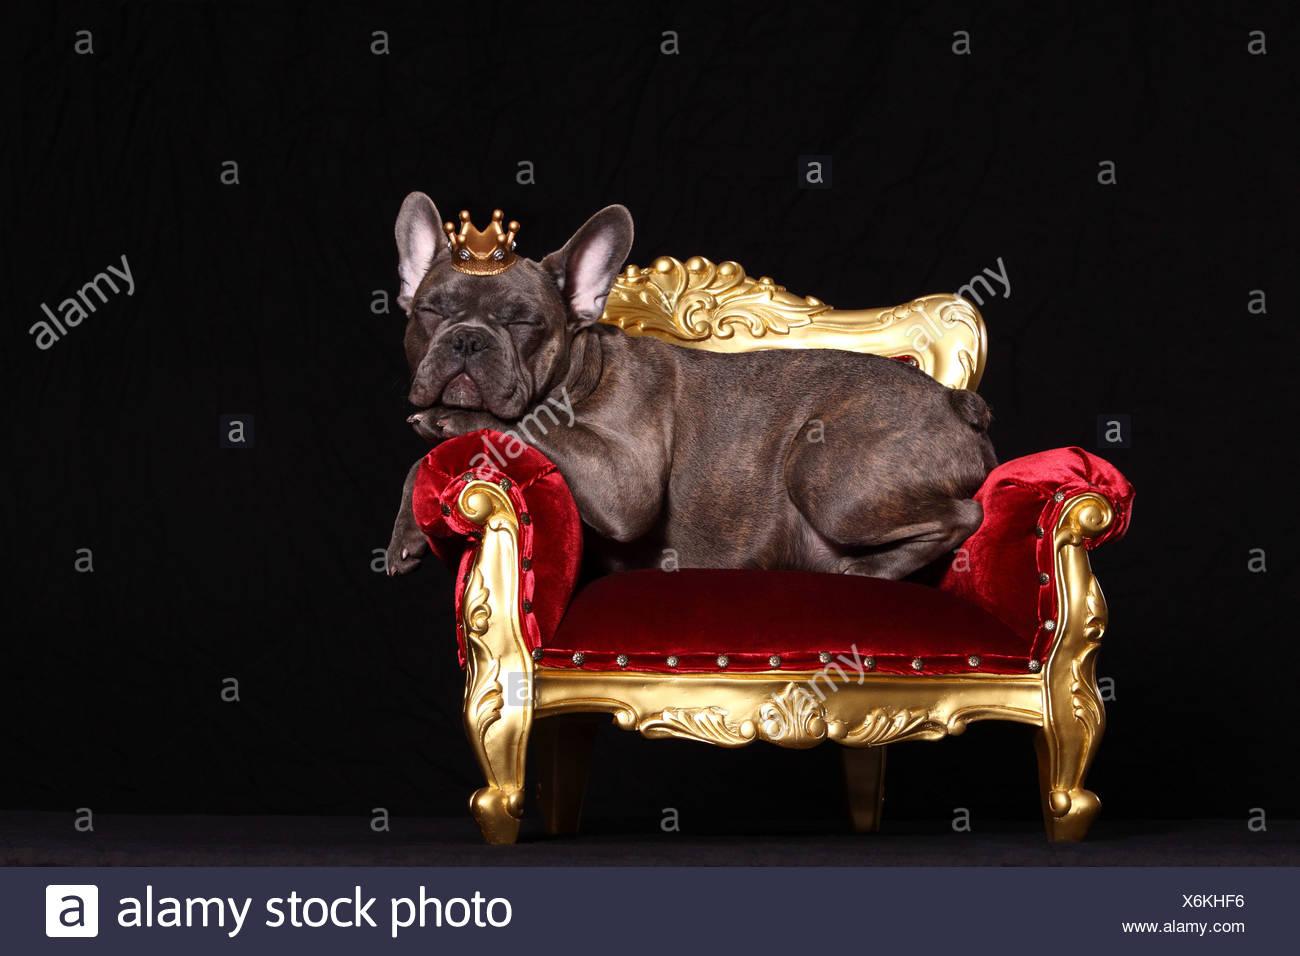 dog crown stock photos dog crown stock images alamy. Black Bedroom Furniture Sets. Home Design Ideas